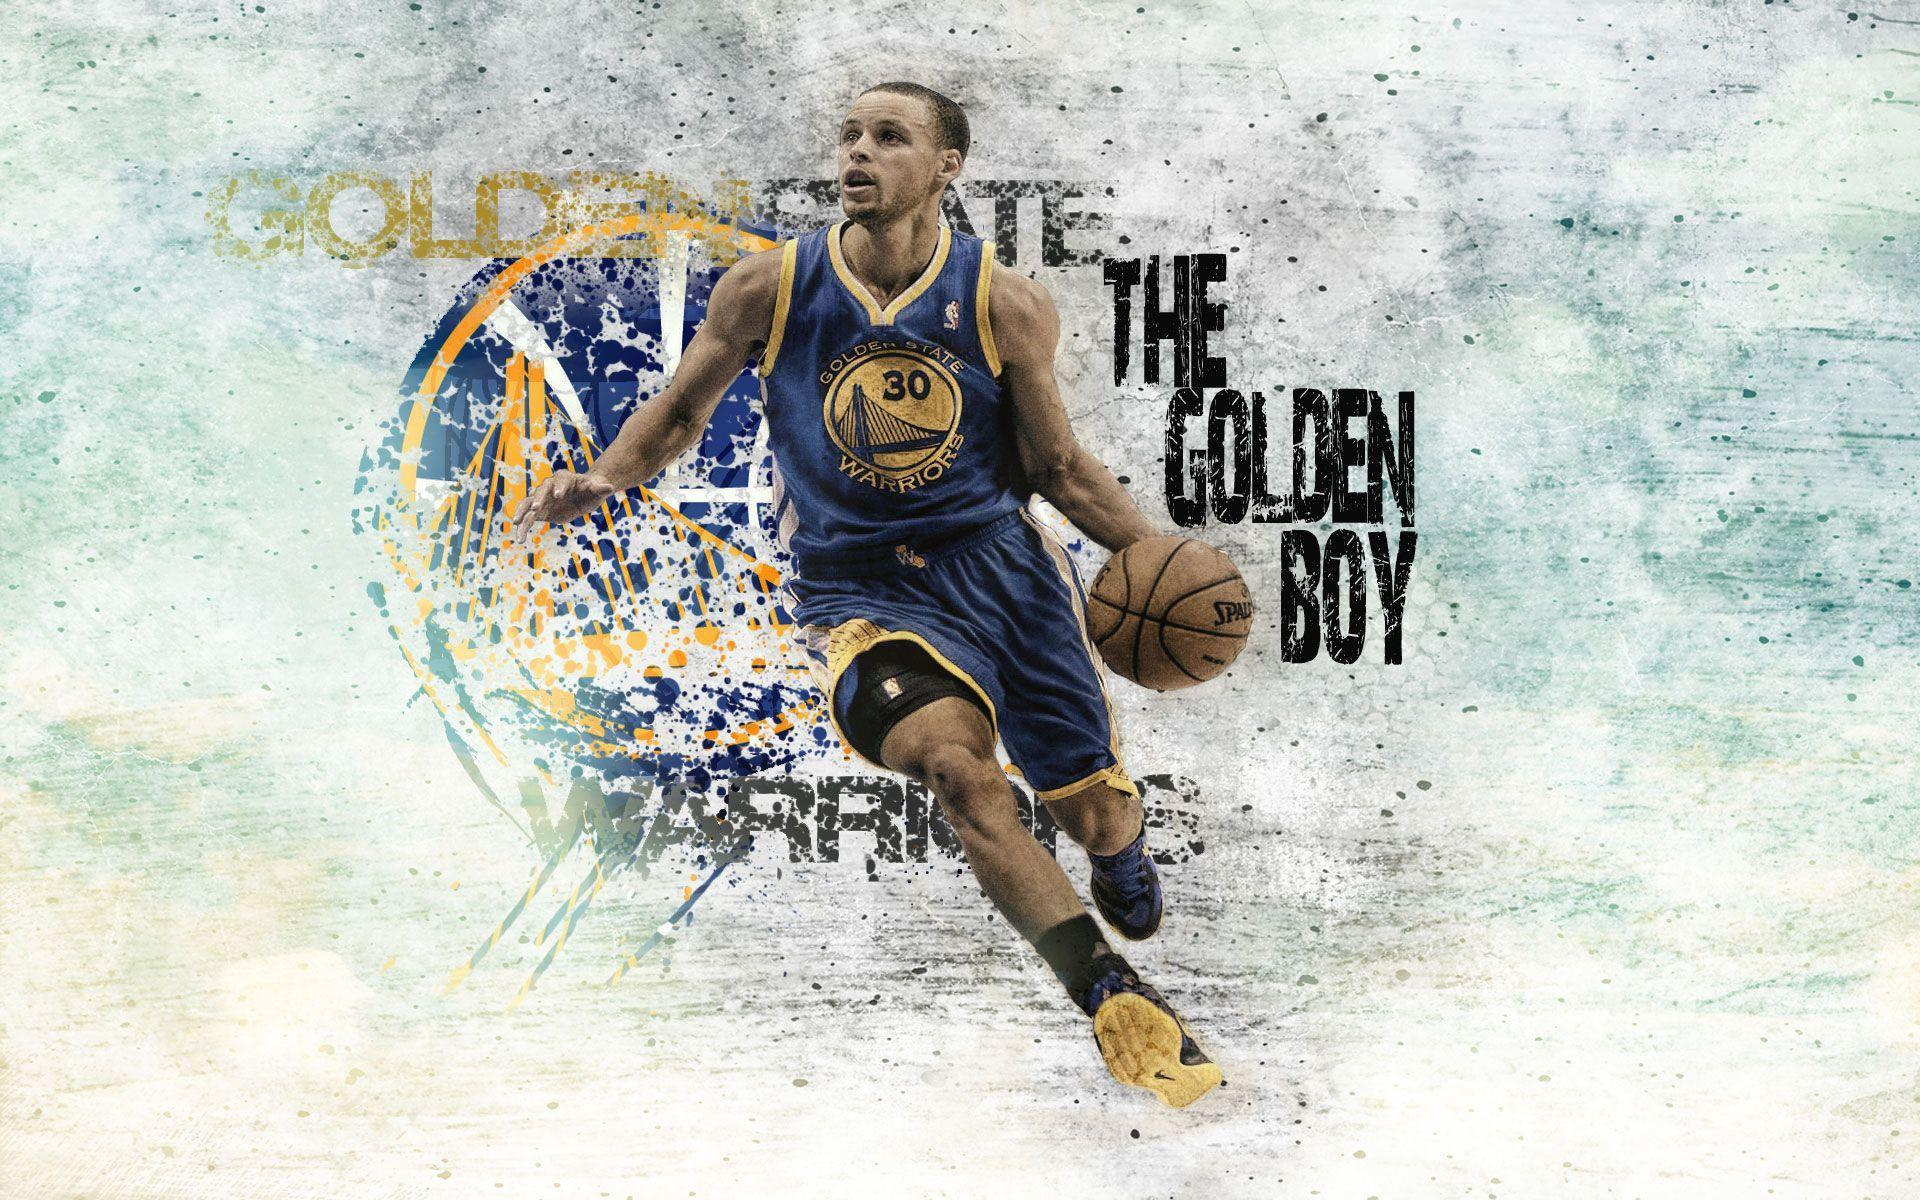 140+ Stephen Curry Wallpaper Ideas That Pop!